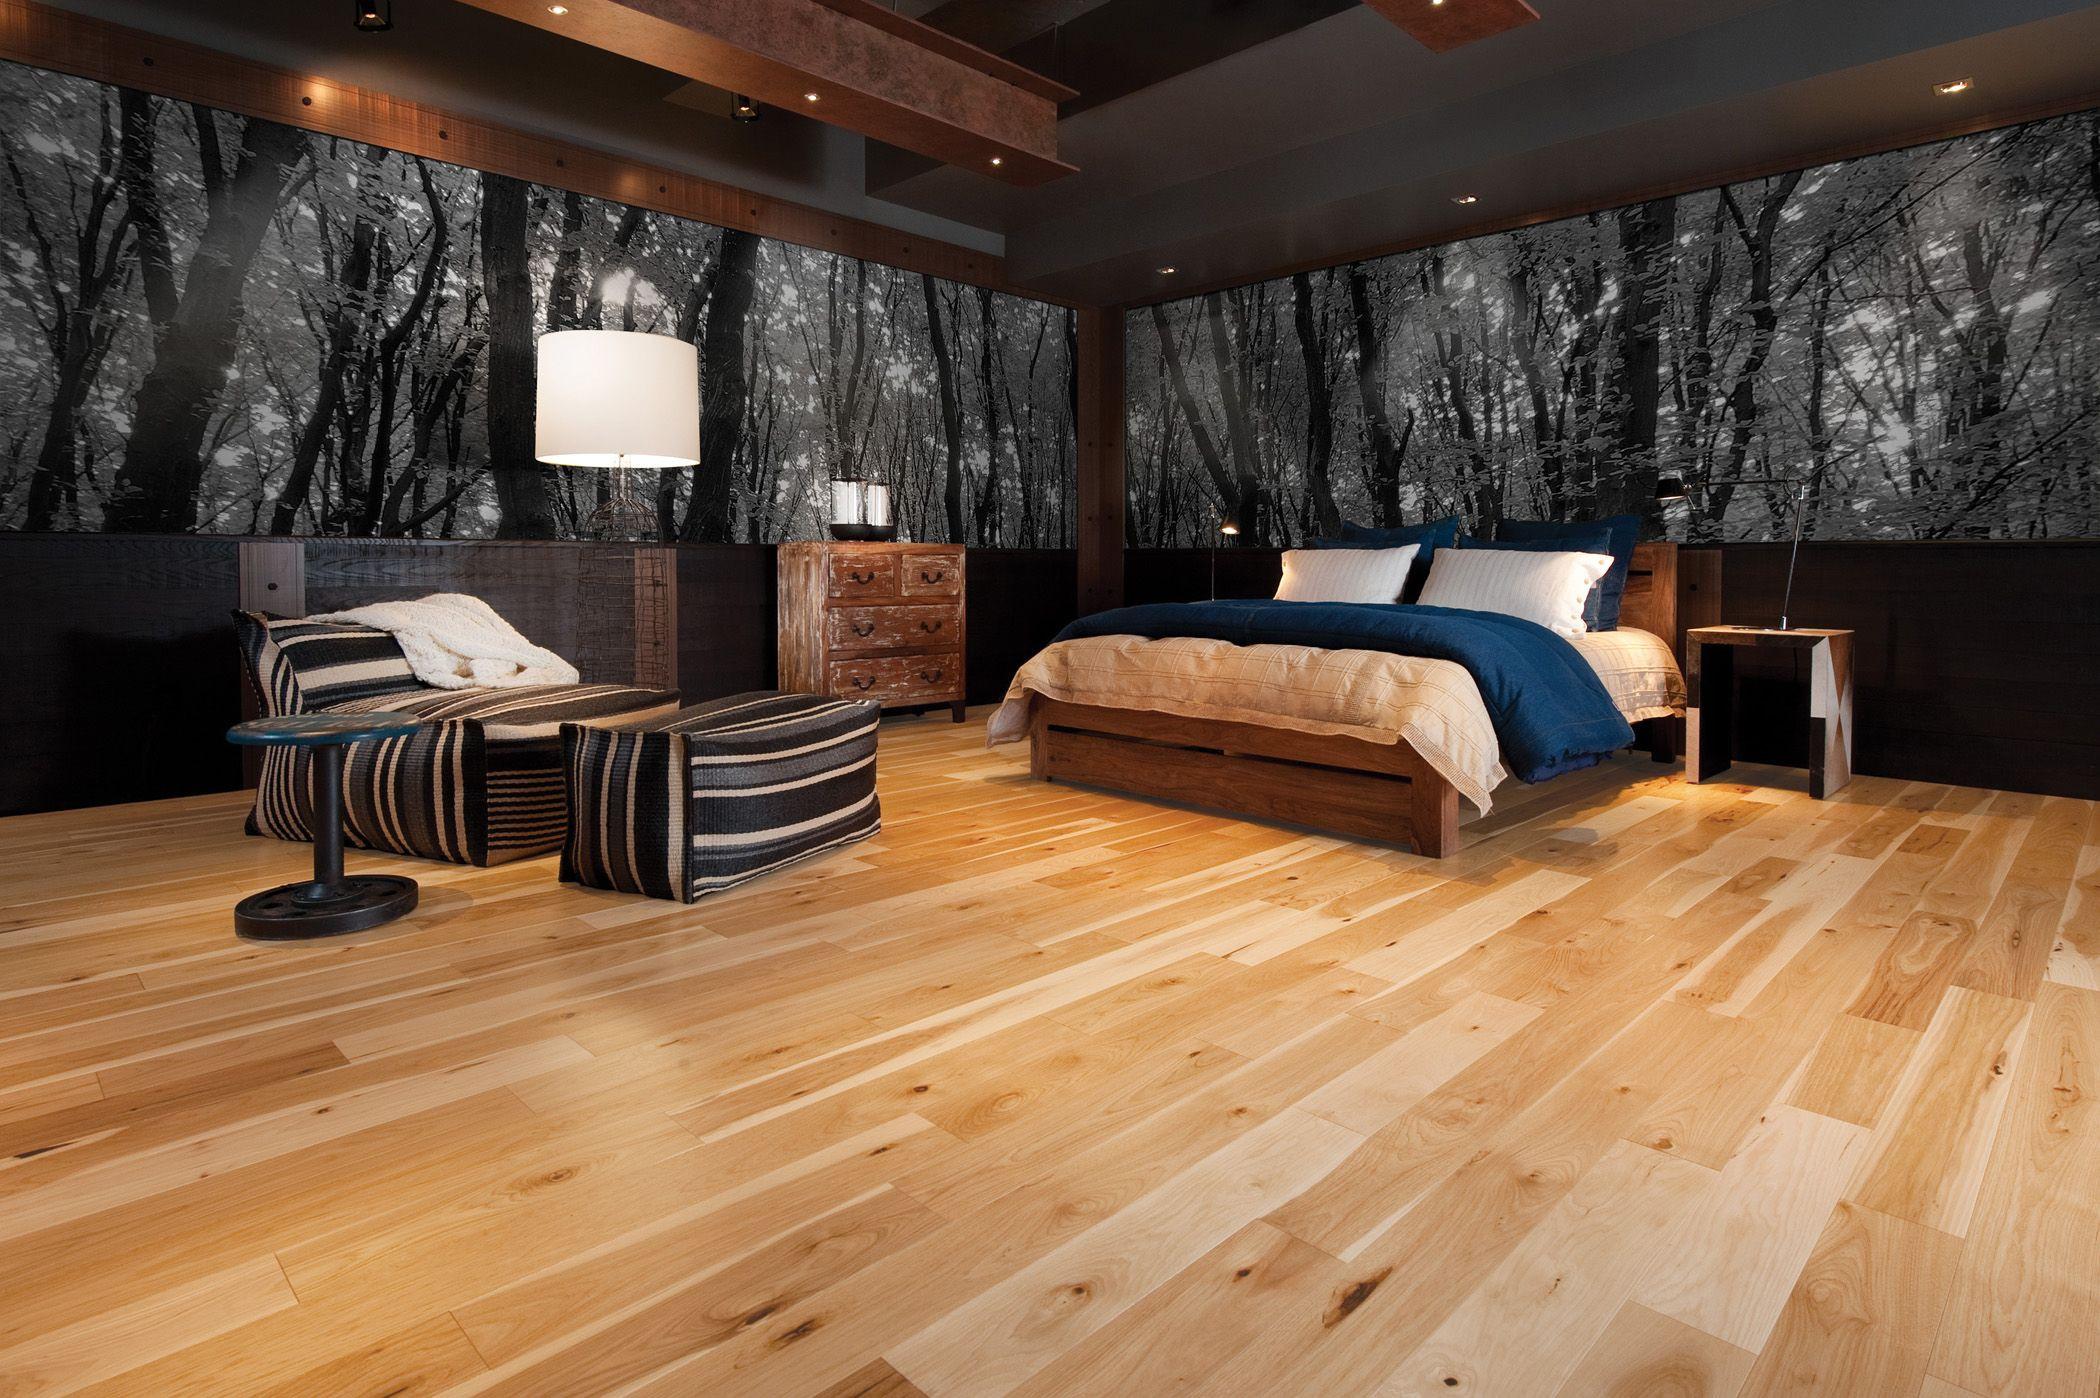 hardwood floor hardness ranking of naturalold hickory mirage hardwood floors available at oscars pertaining to naturalold hickory mirage hardwood floors available at oscars carpet one flooring